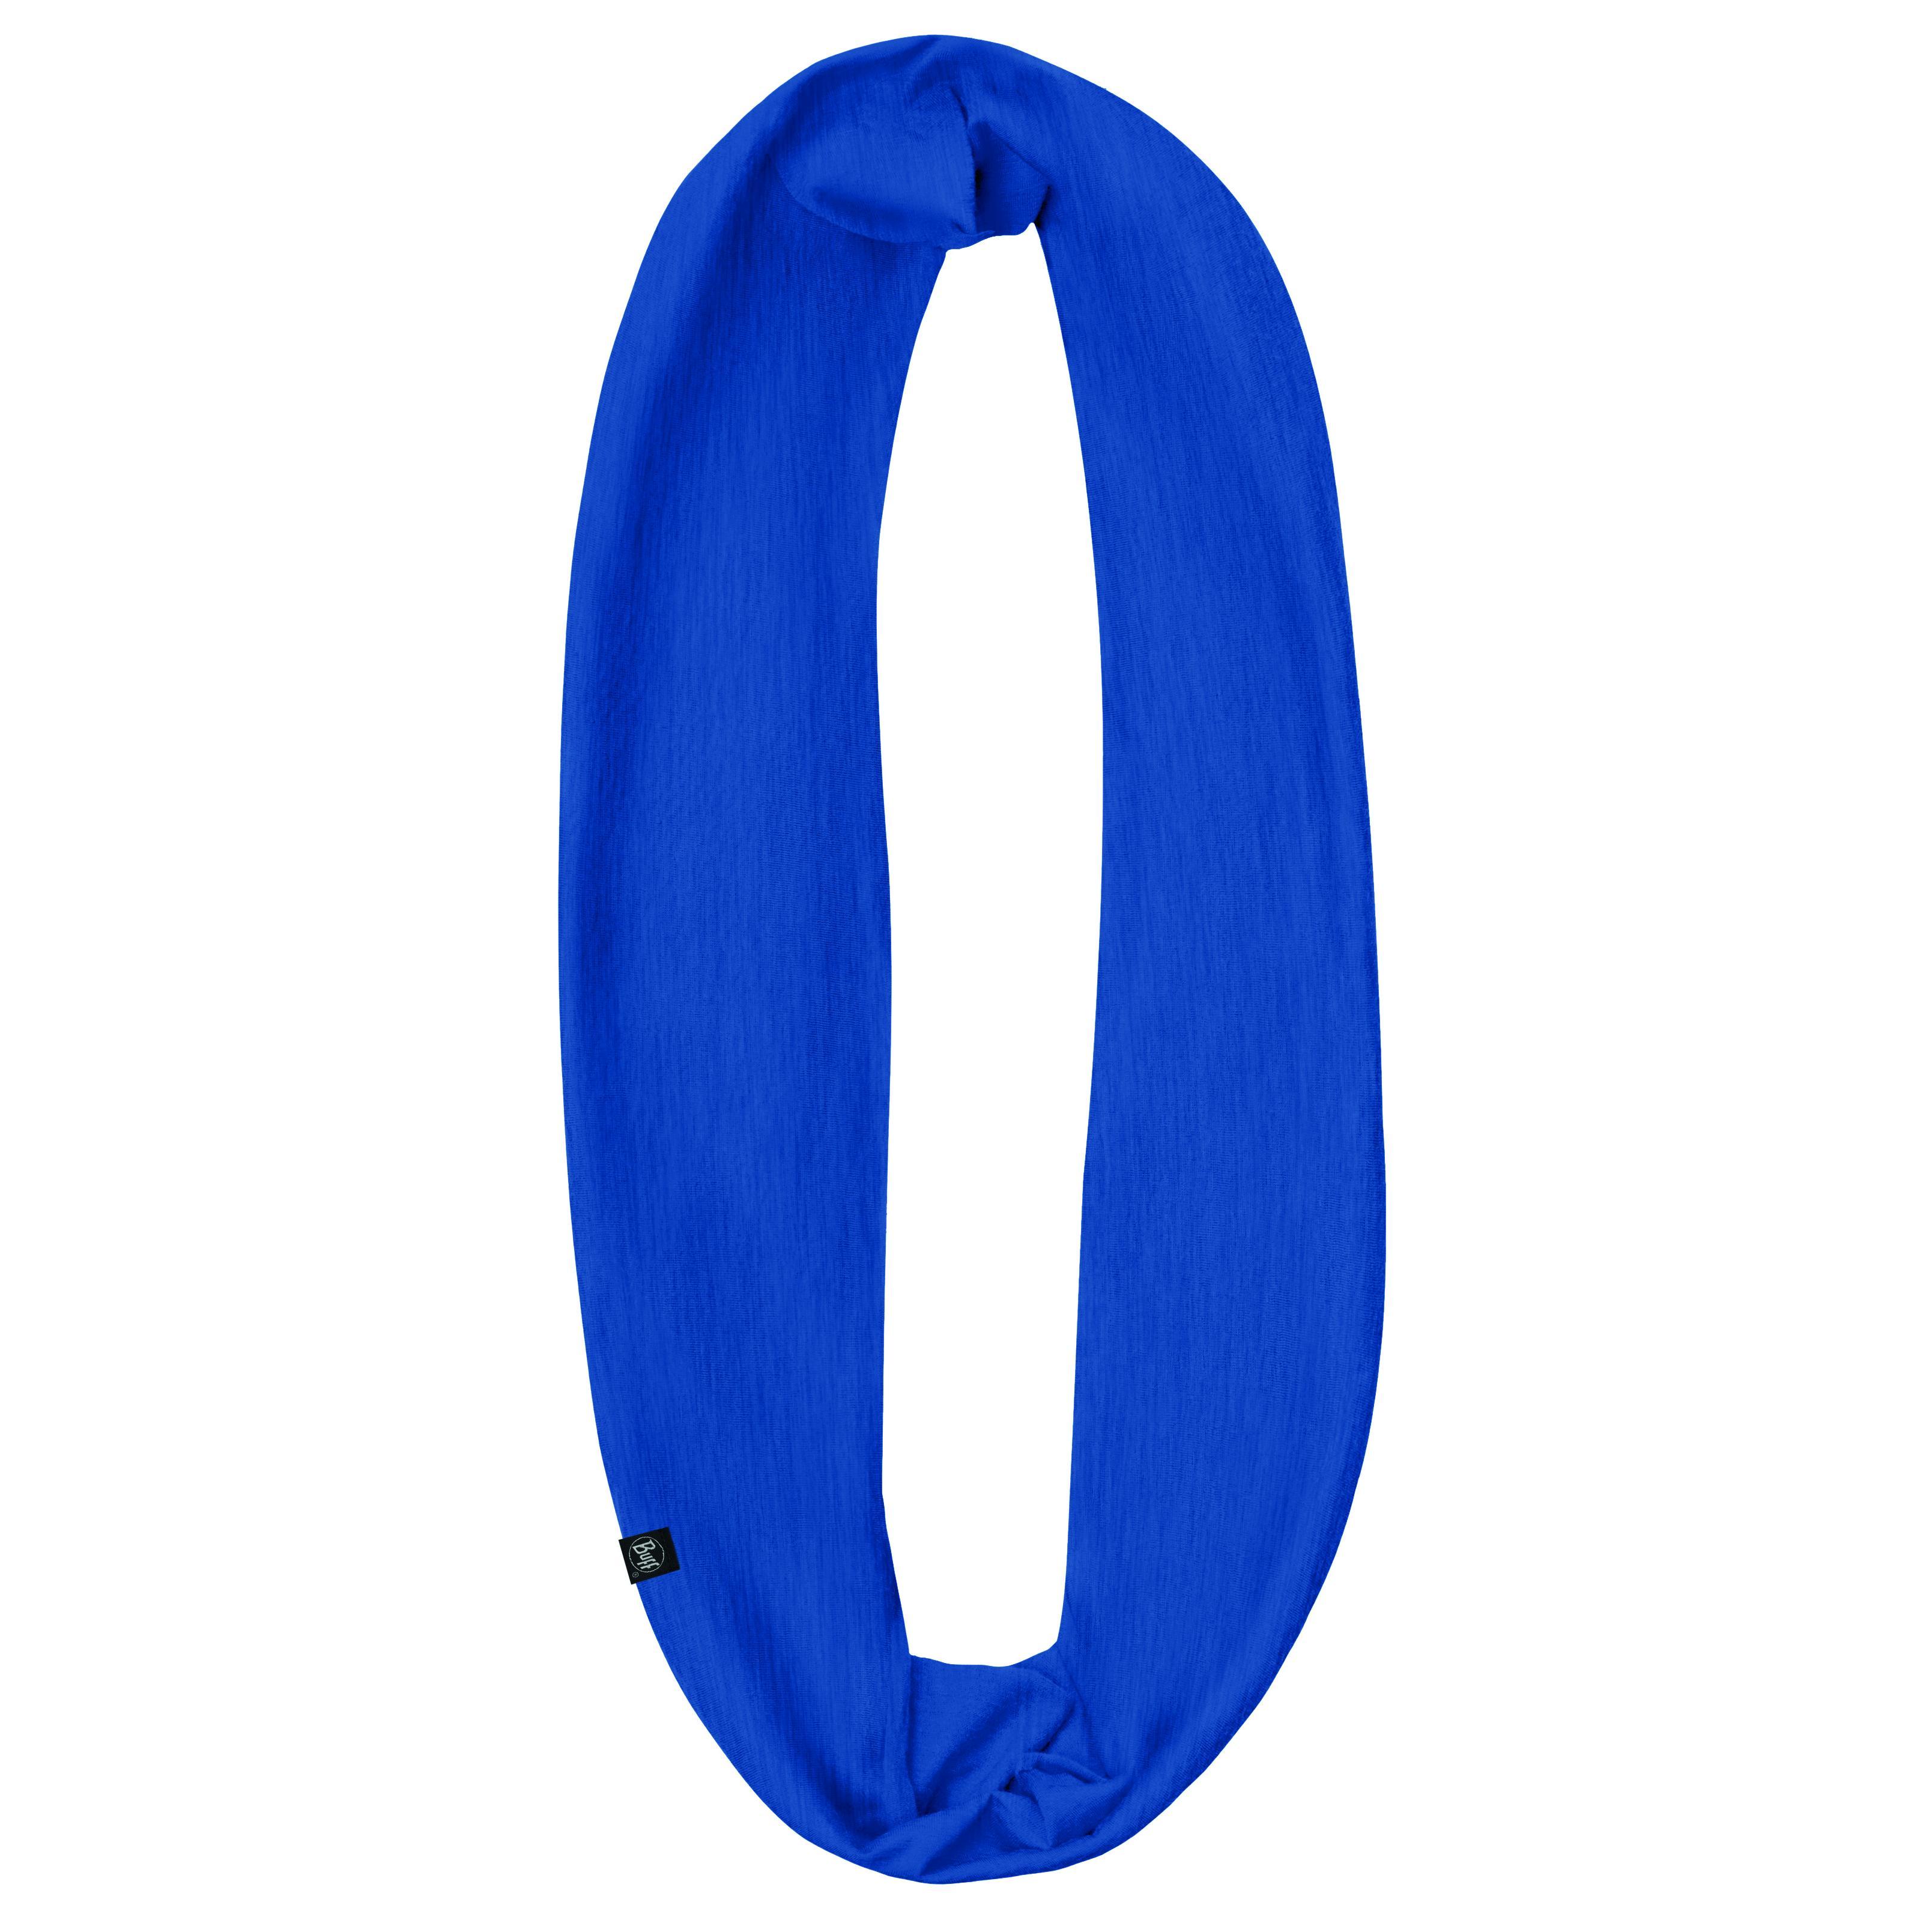 Купить Шарф BUFF INFINITY SOLID MEDIEVAL BLUE Банданы и шарфы Buff ® 1312901